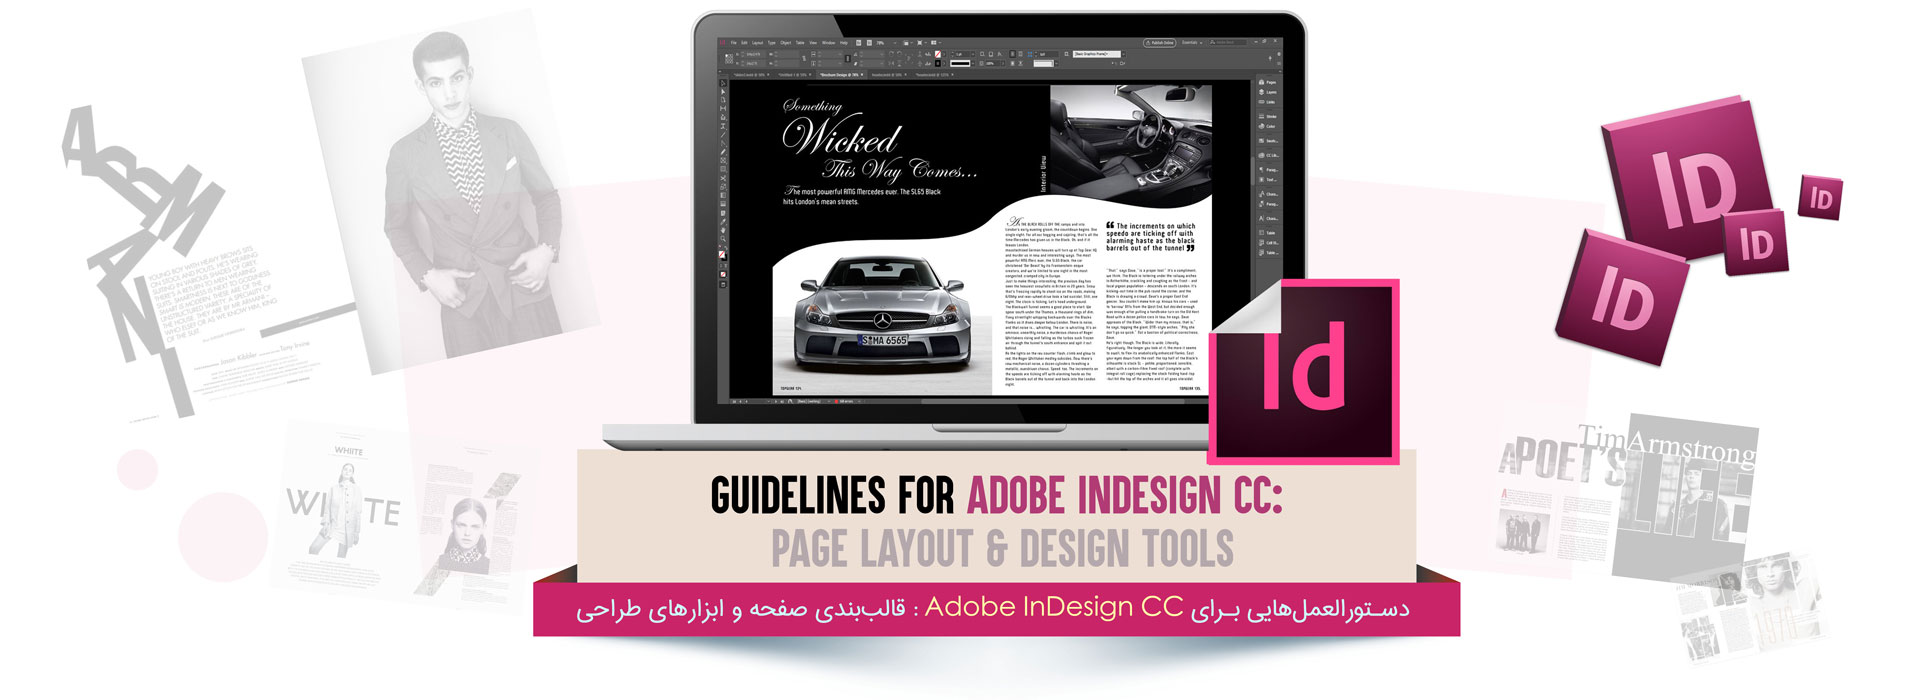 Page layout Design tools Indesign 1 - قالببندی صفحه و ابزارهای طراحی ایندیزاین